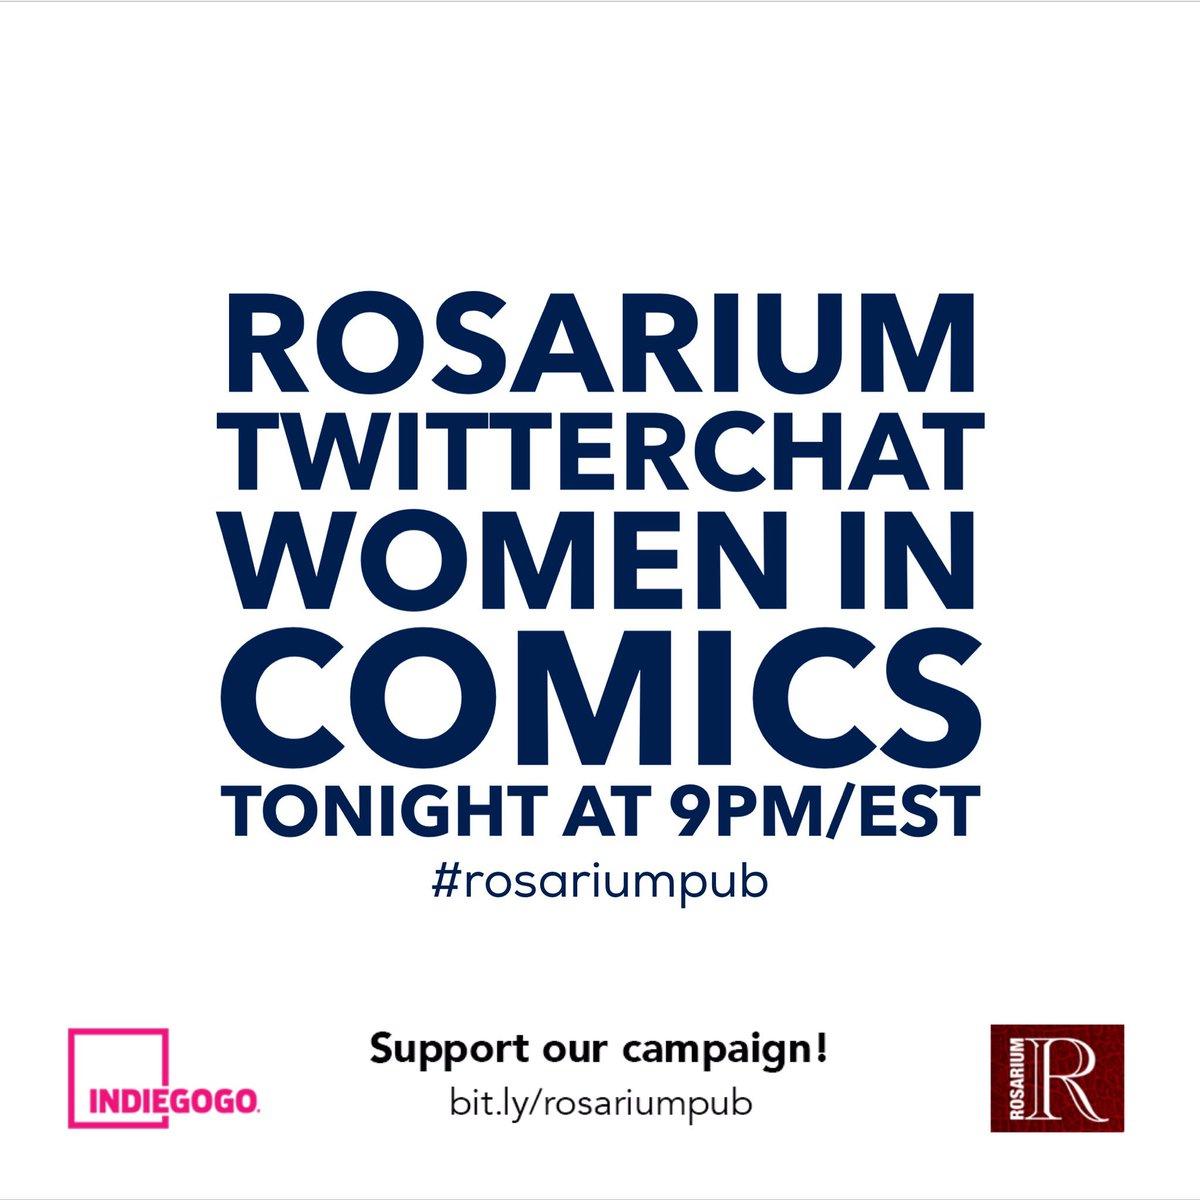 .@Ovenland @candybriones @LizMayorga1 @trinidadesco r talking #womenincomics @9pmEST please join us! #rosariumpub https://t.co/rRFU0f4ILw